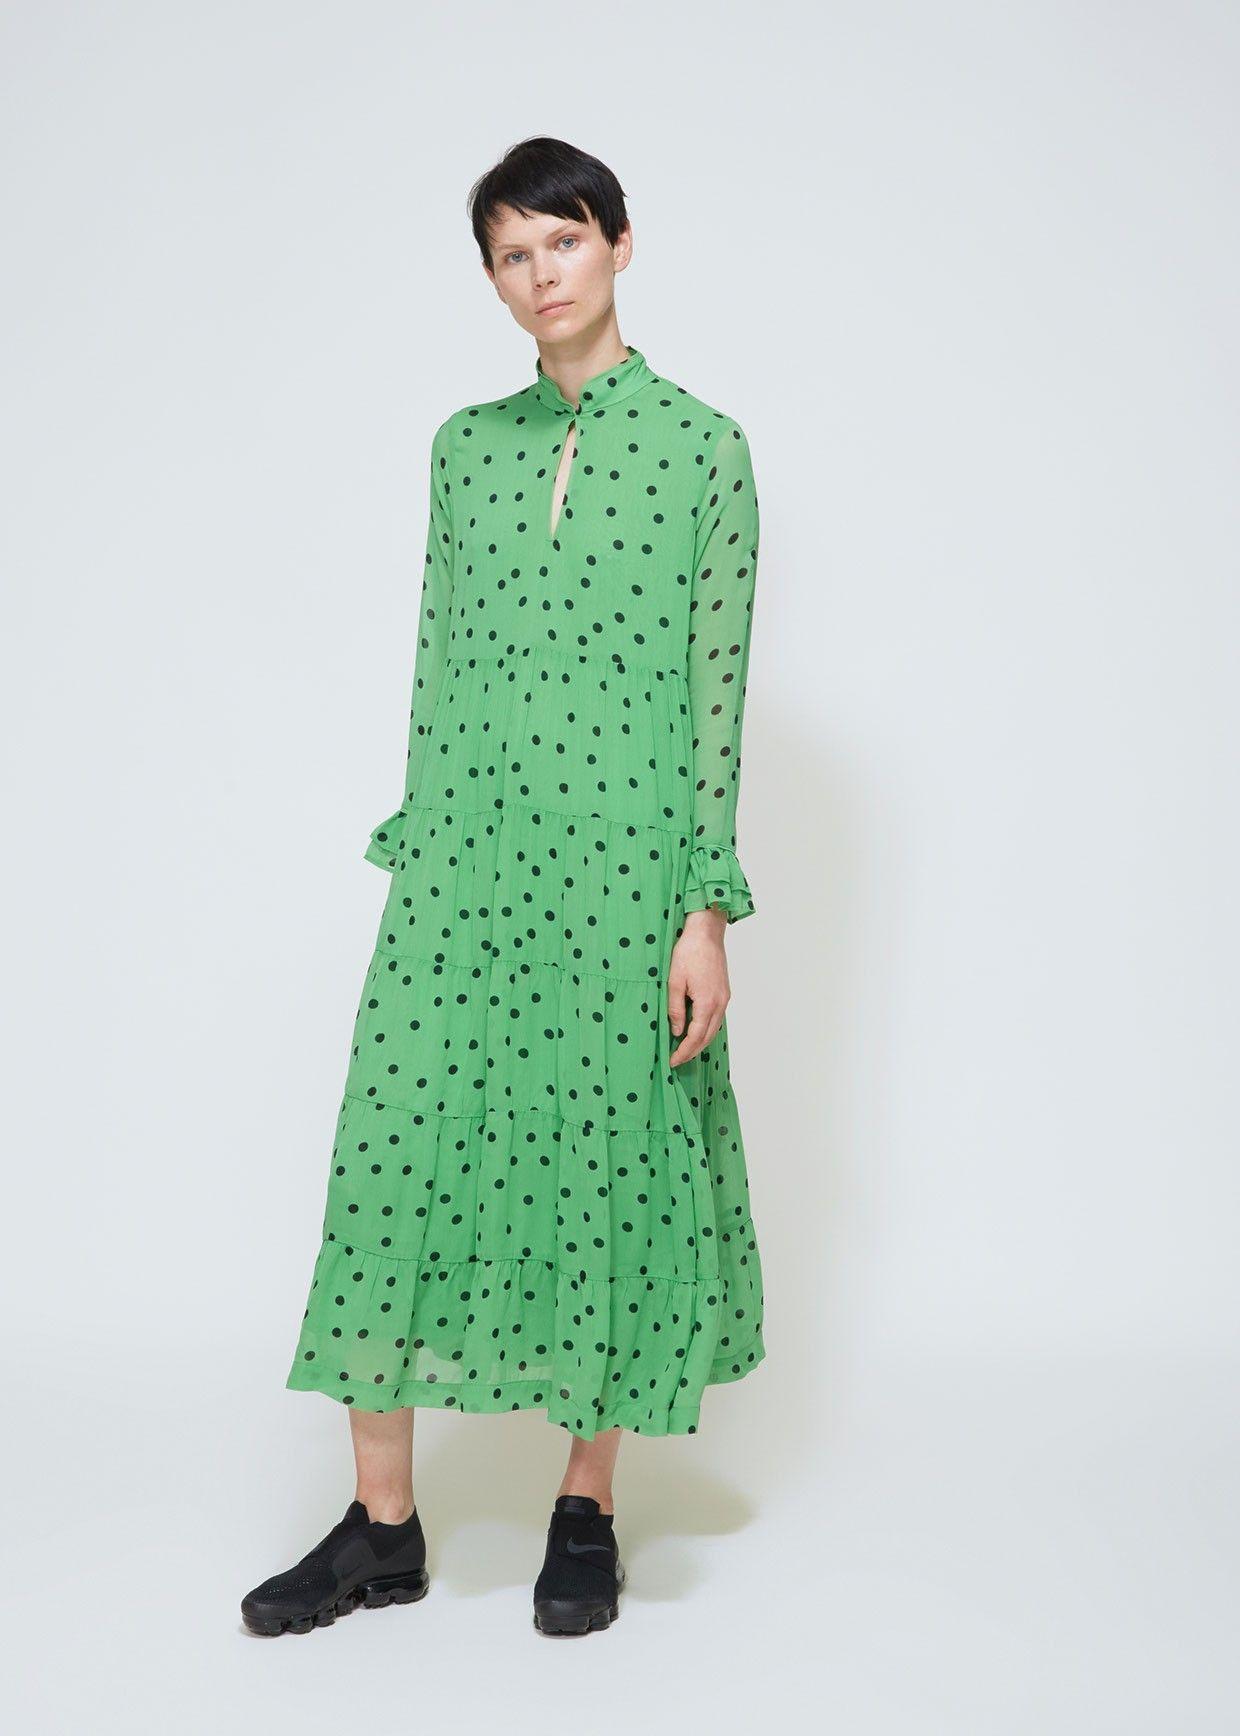 29bdaebadf1c Totokaelo Dainty Georgette Dress - Ganni - Designers - Womens